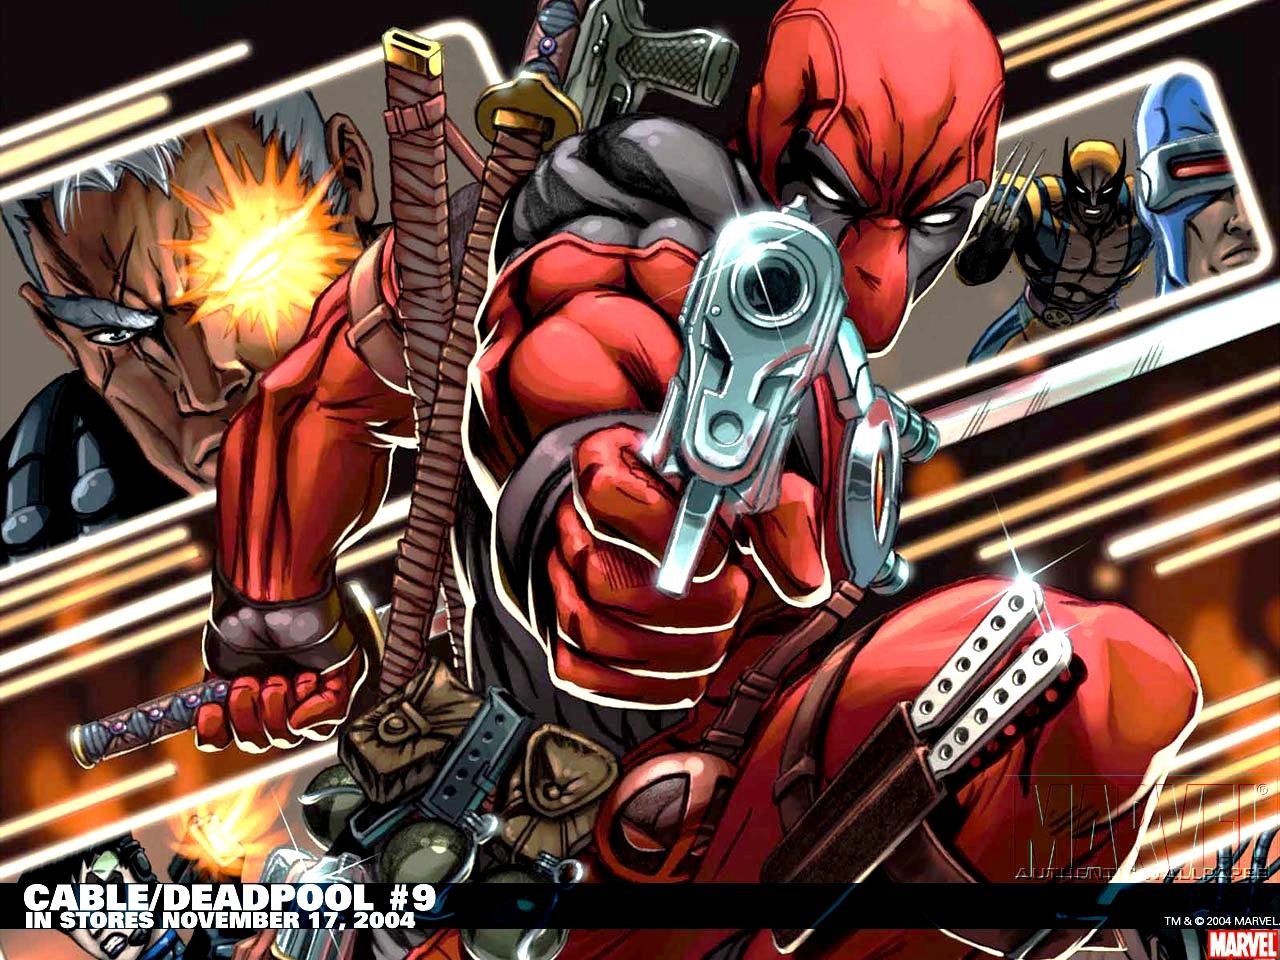 Deadpool wallpaper 1280x960